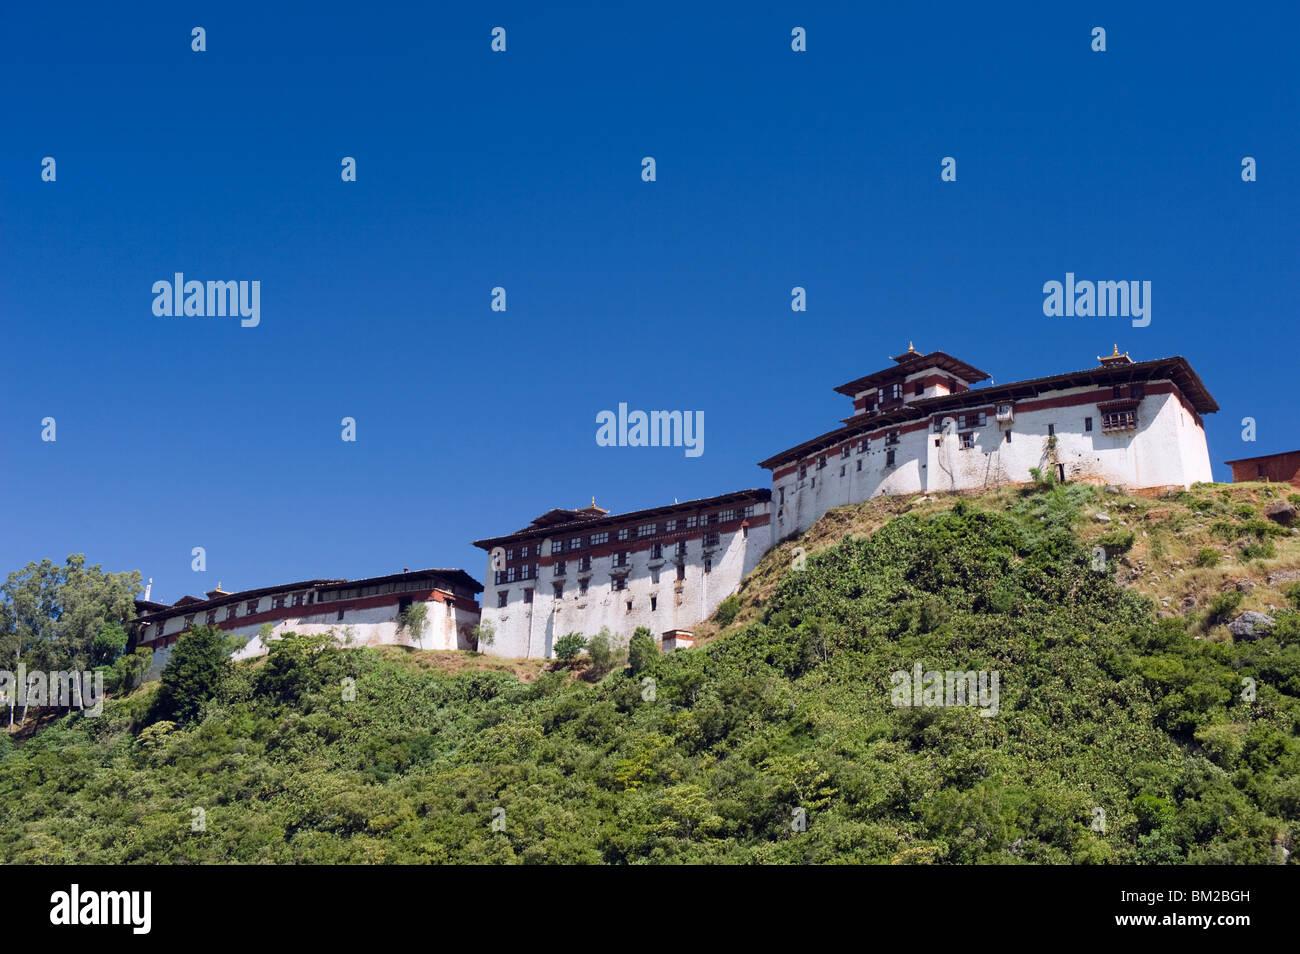 Ridge top Wangdue Phodrang Dzong, founded by the Zhabdrung in 1638, Bhutan - Stock Image